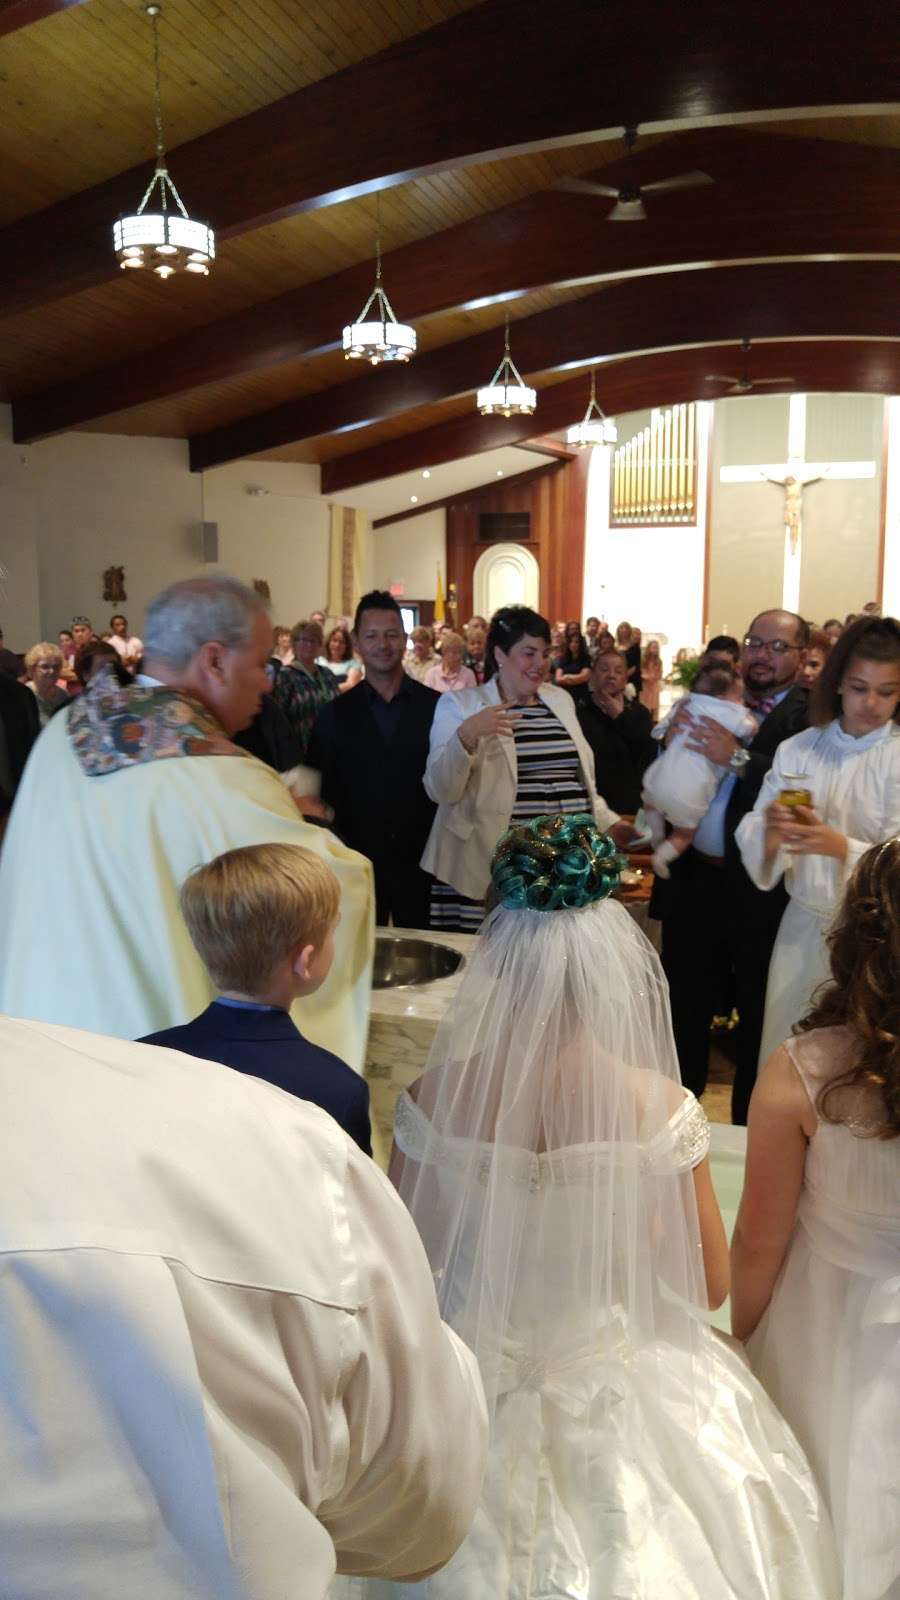 St. Margarets of Cortona Church - church  | Photo 4 of 10 | Address: 31 Chamberlain Ave, Little Ferry, NJ 07643, USA | Phone: (201) 641-2988